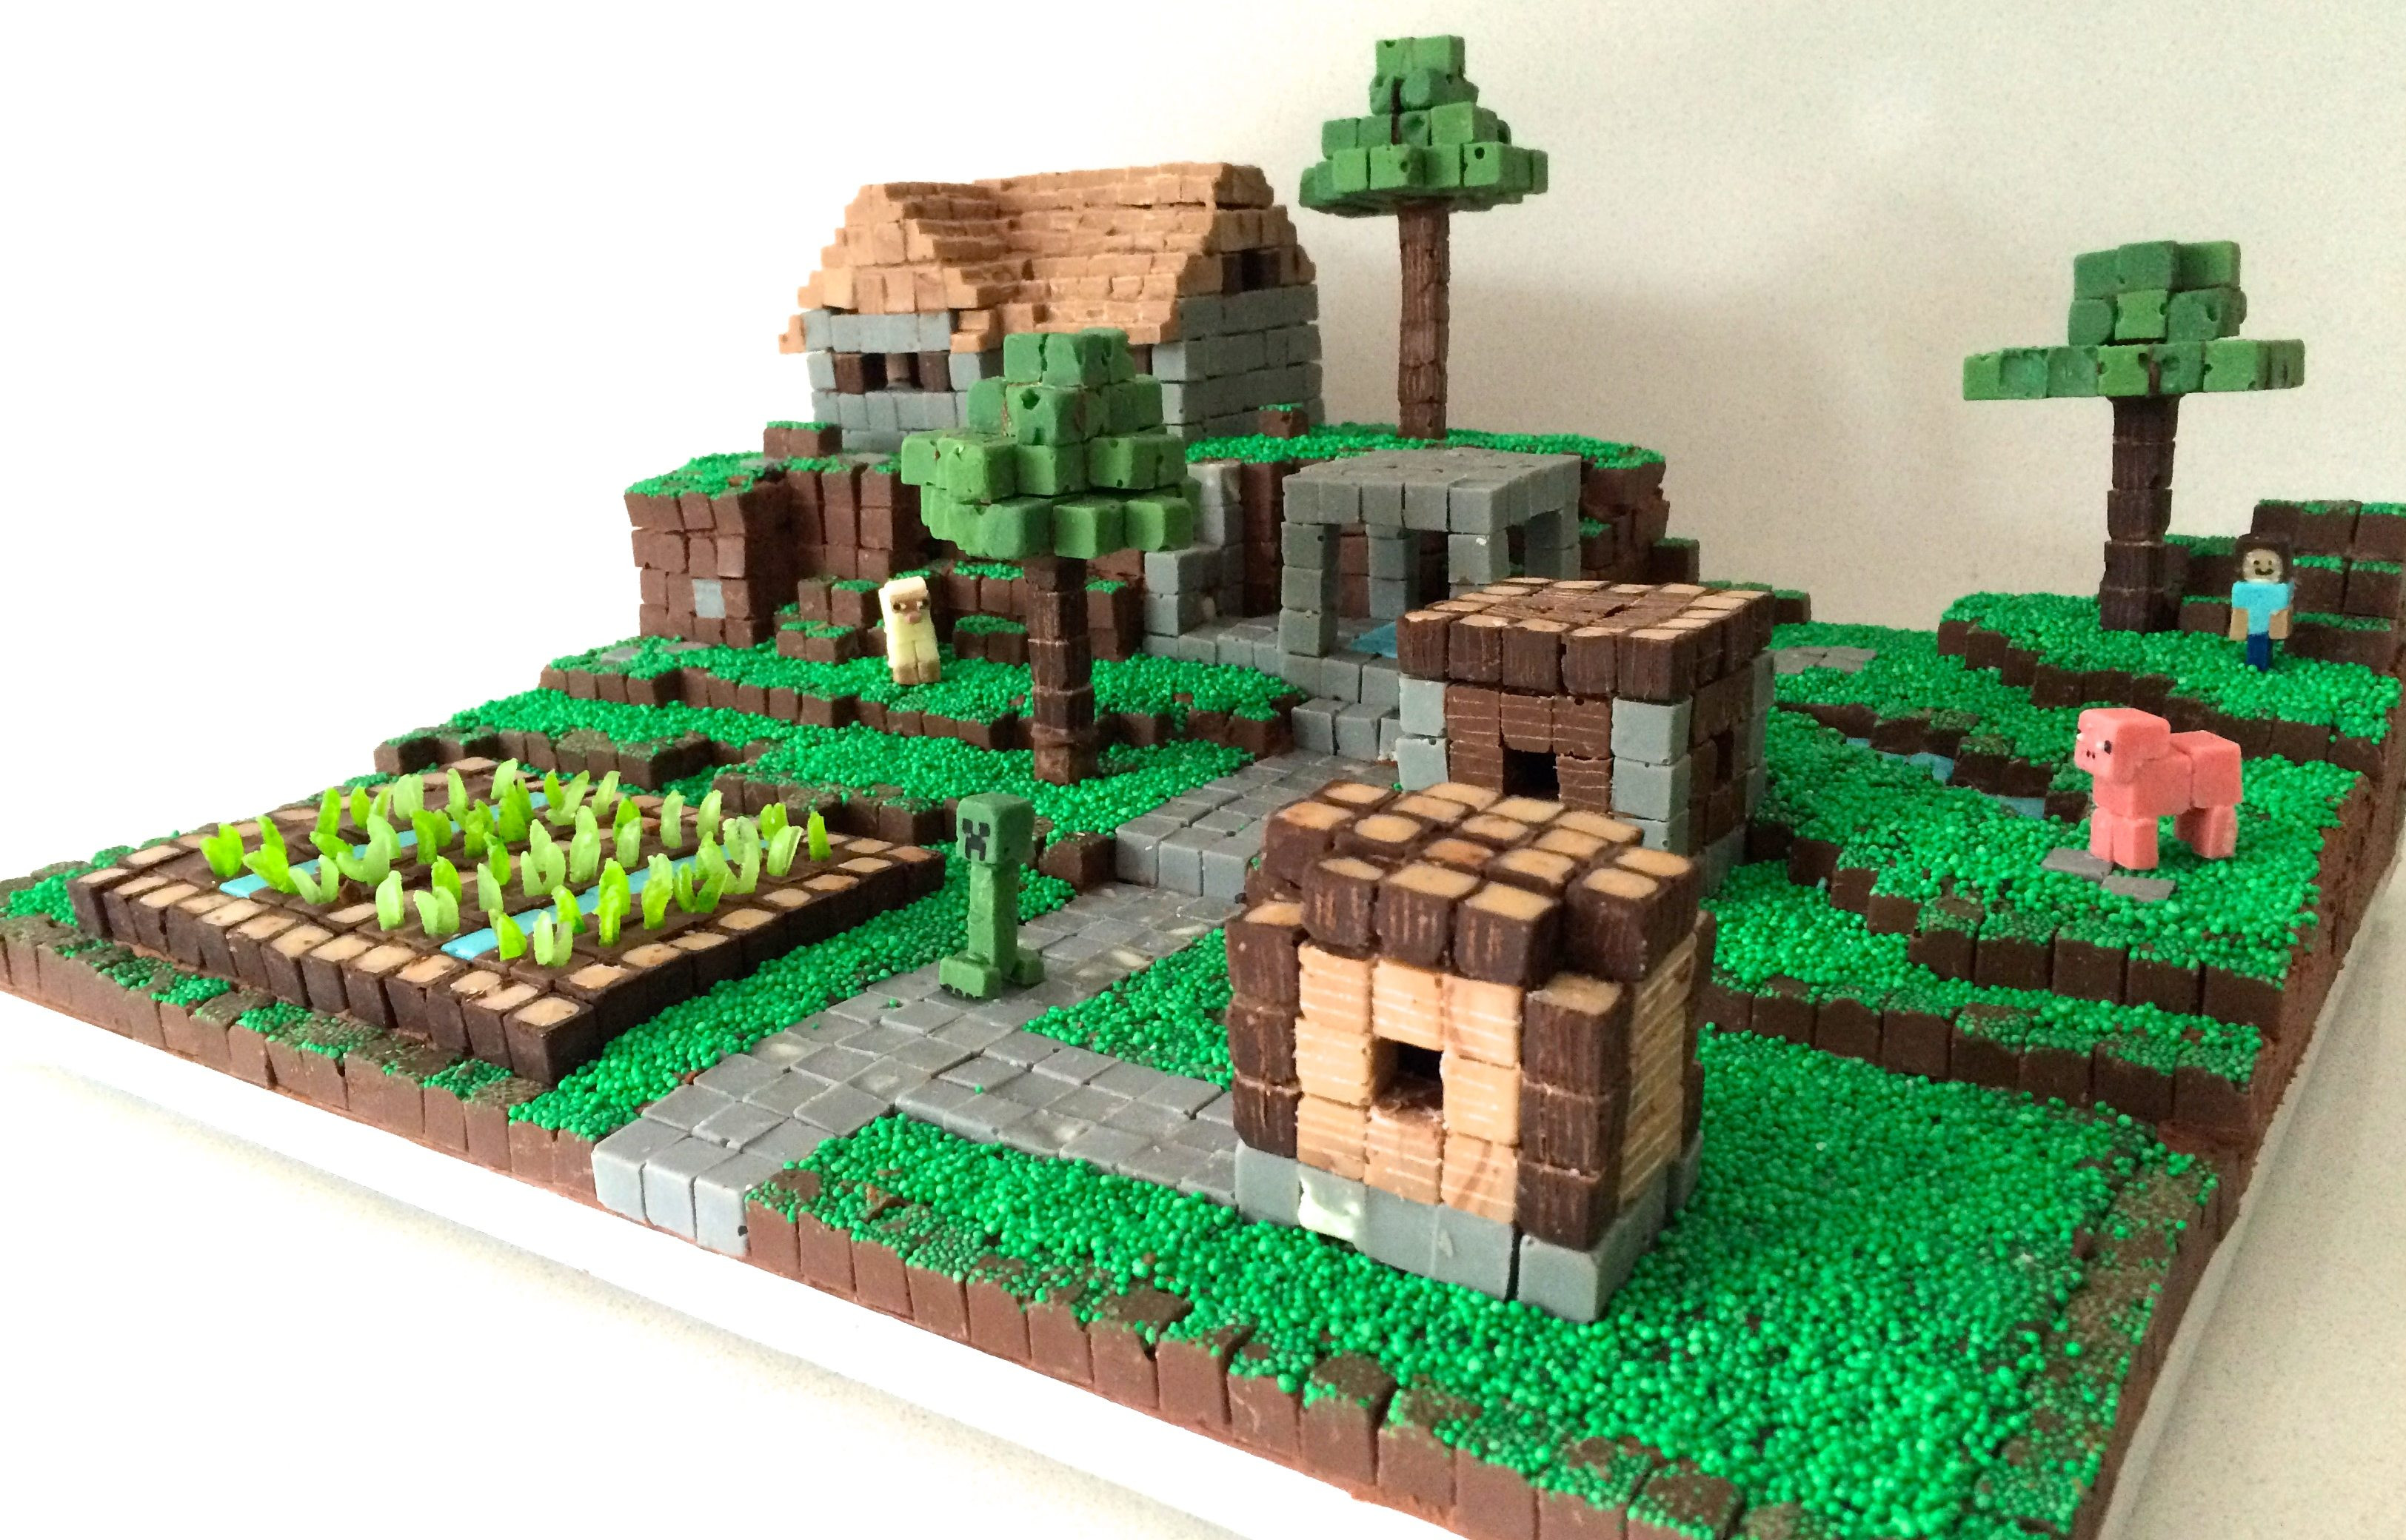 Cake Recipe Minecraft  HowToCookThat Cakes Dessert & Chocolate